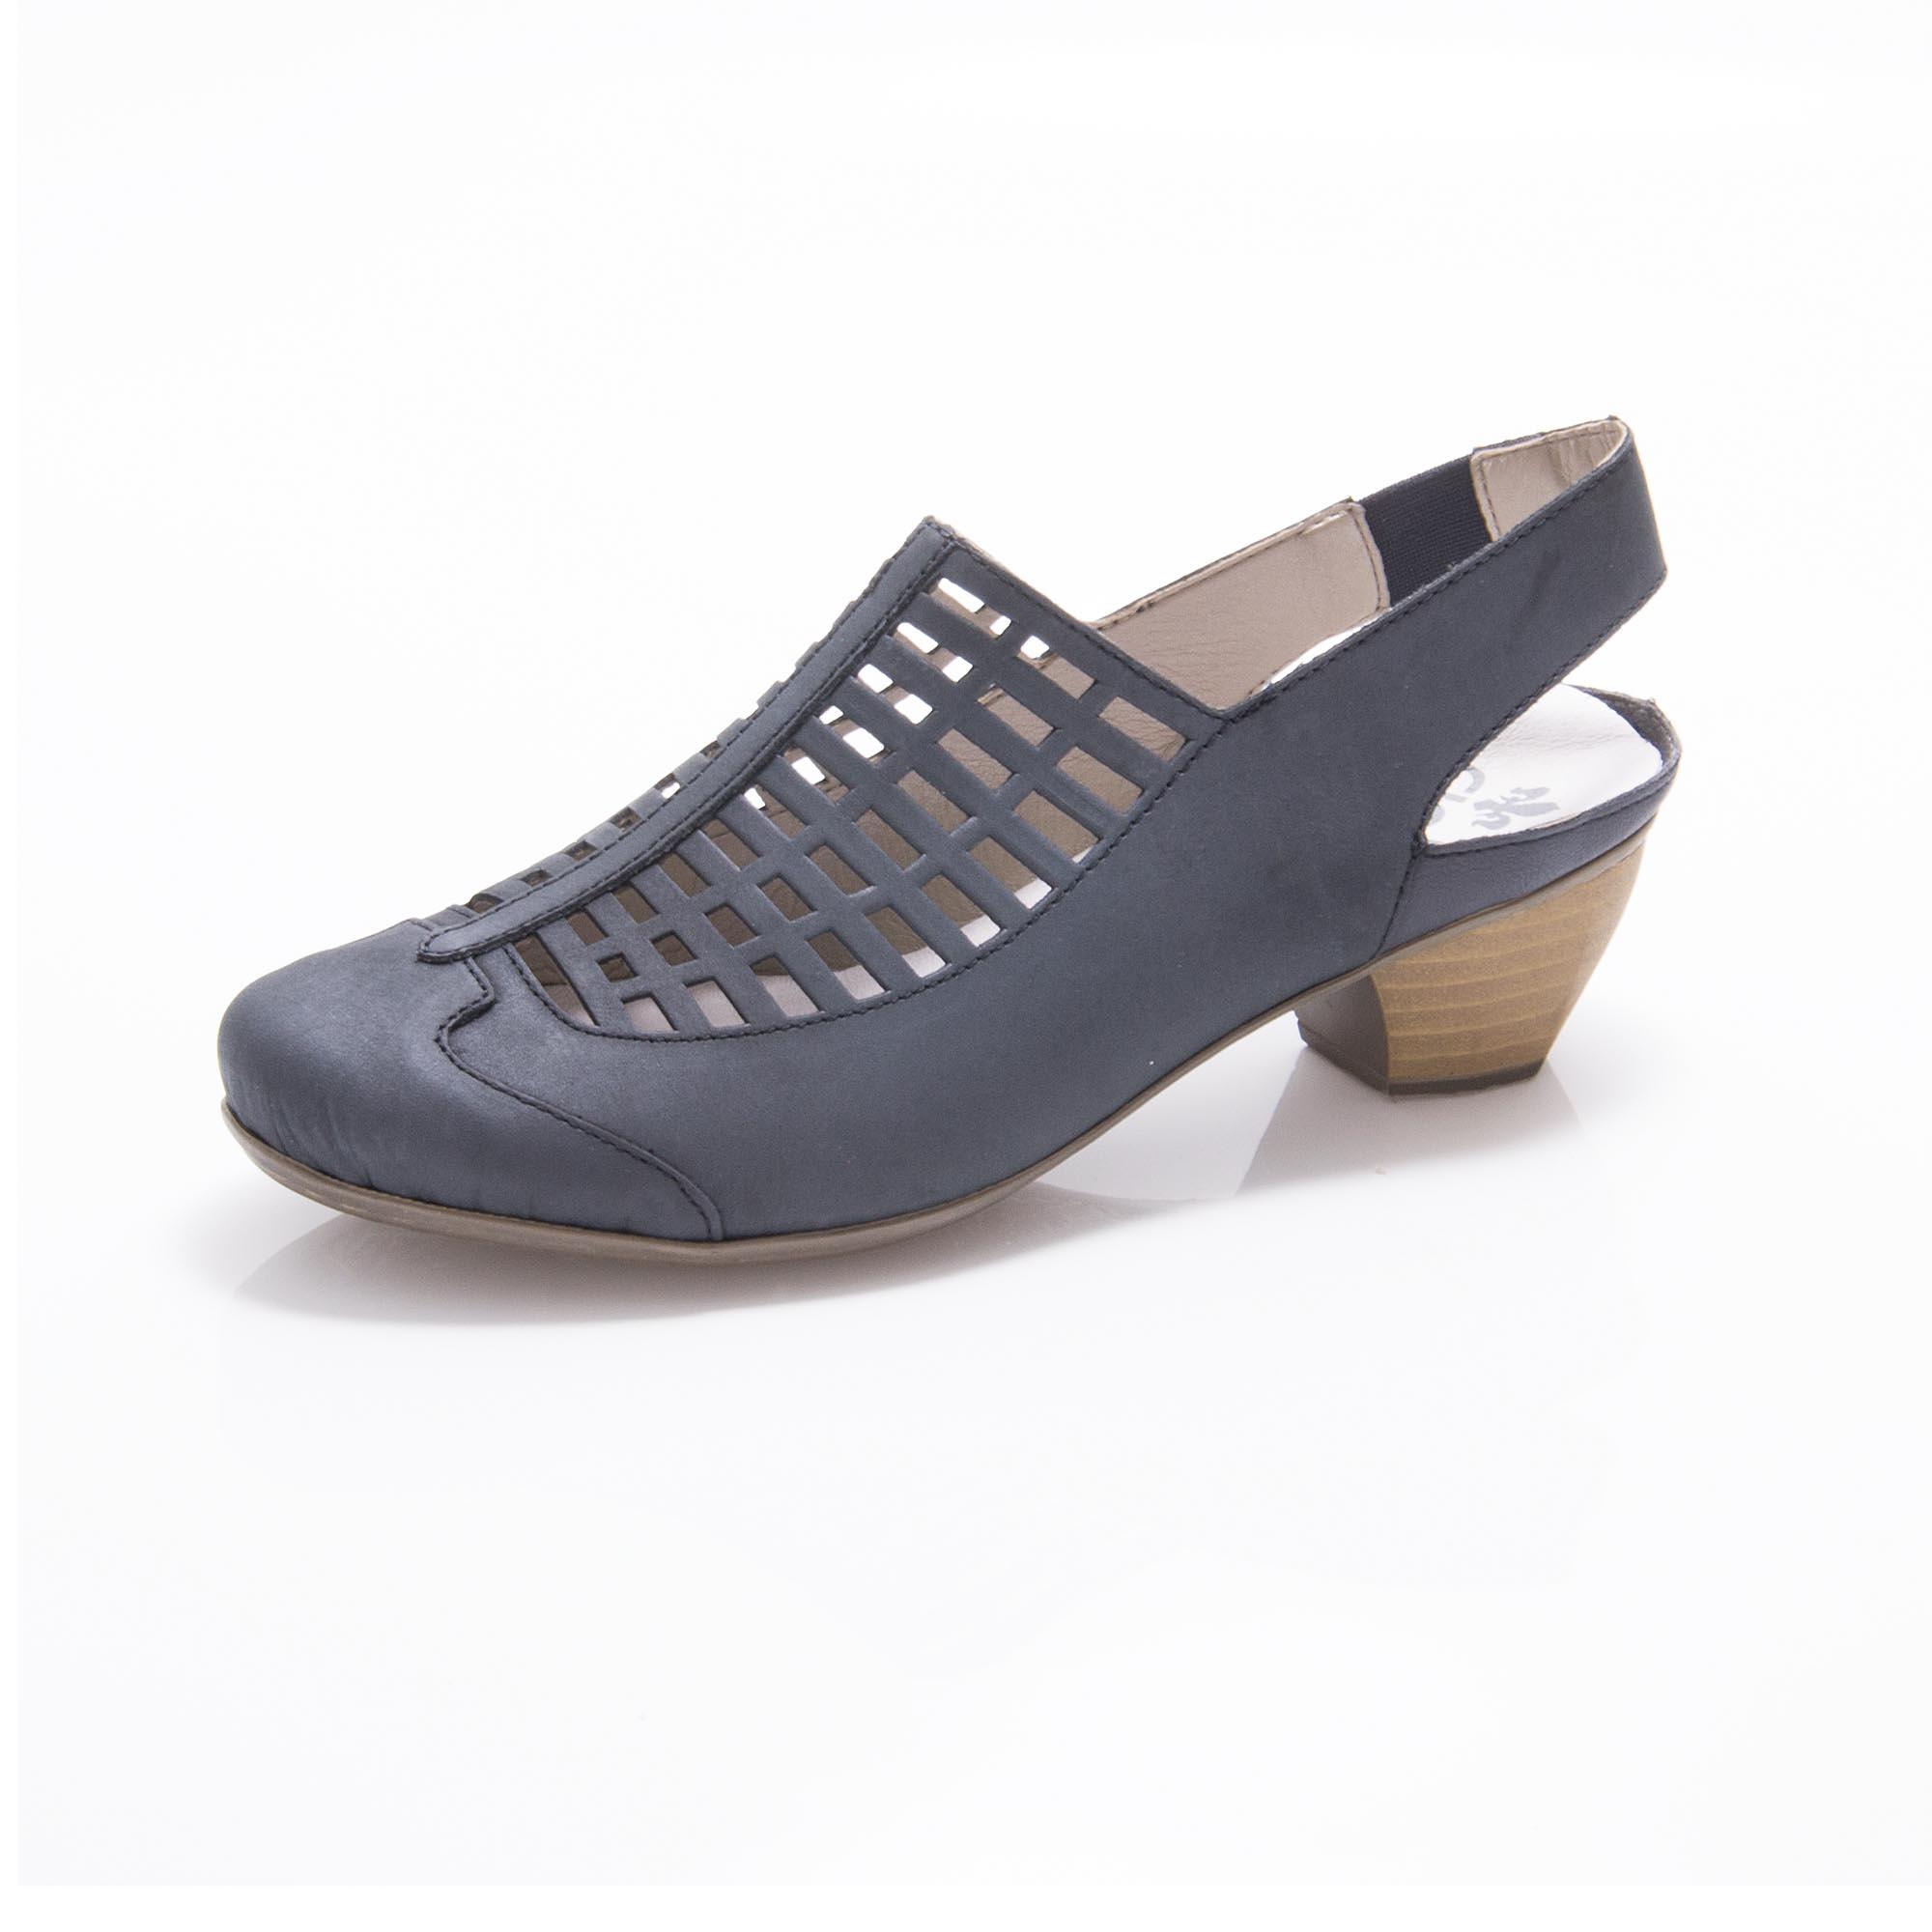 Dámská obuv RIEKER41731-14 BLAU F S 9  f4a032000d